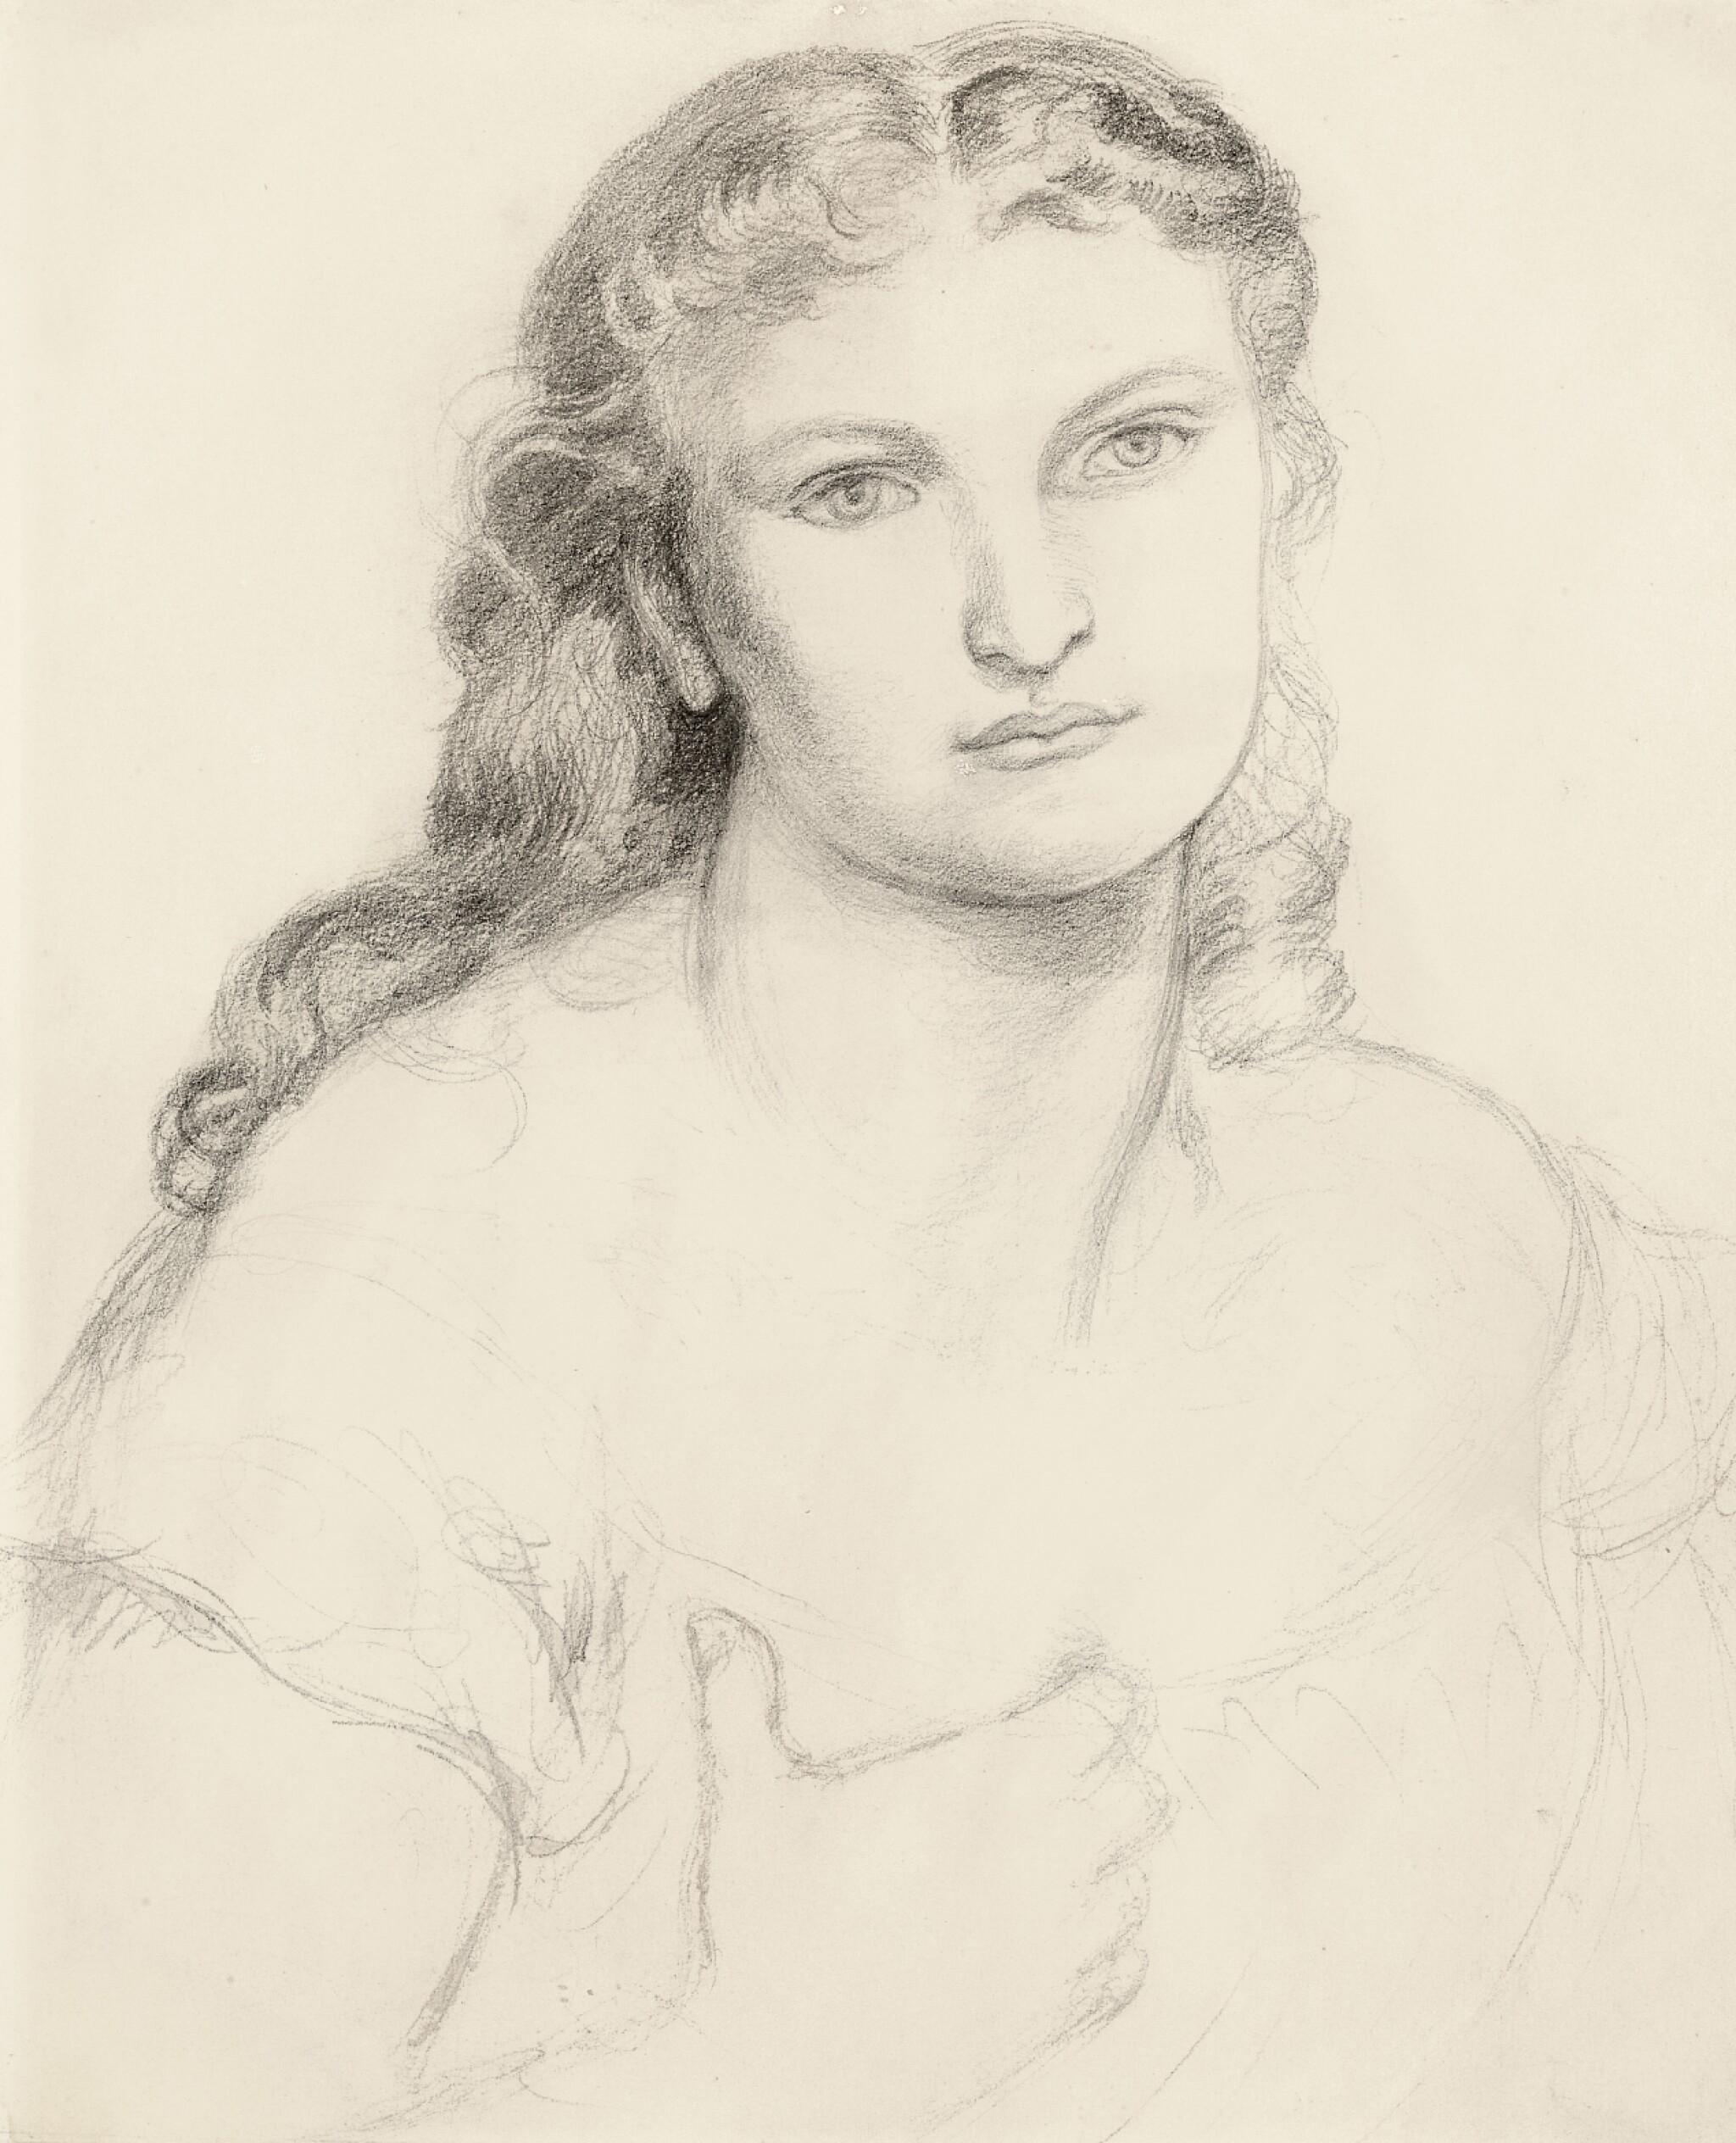 DANTE GABRIEL ROSSETTI | Sketch for Venus Verticordia